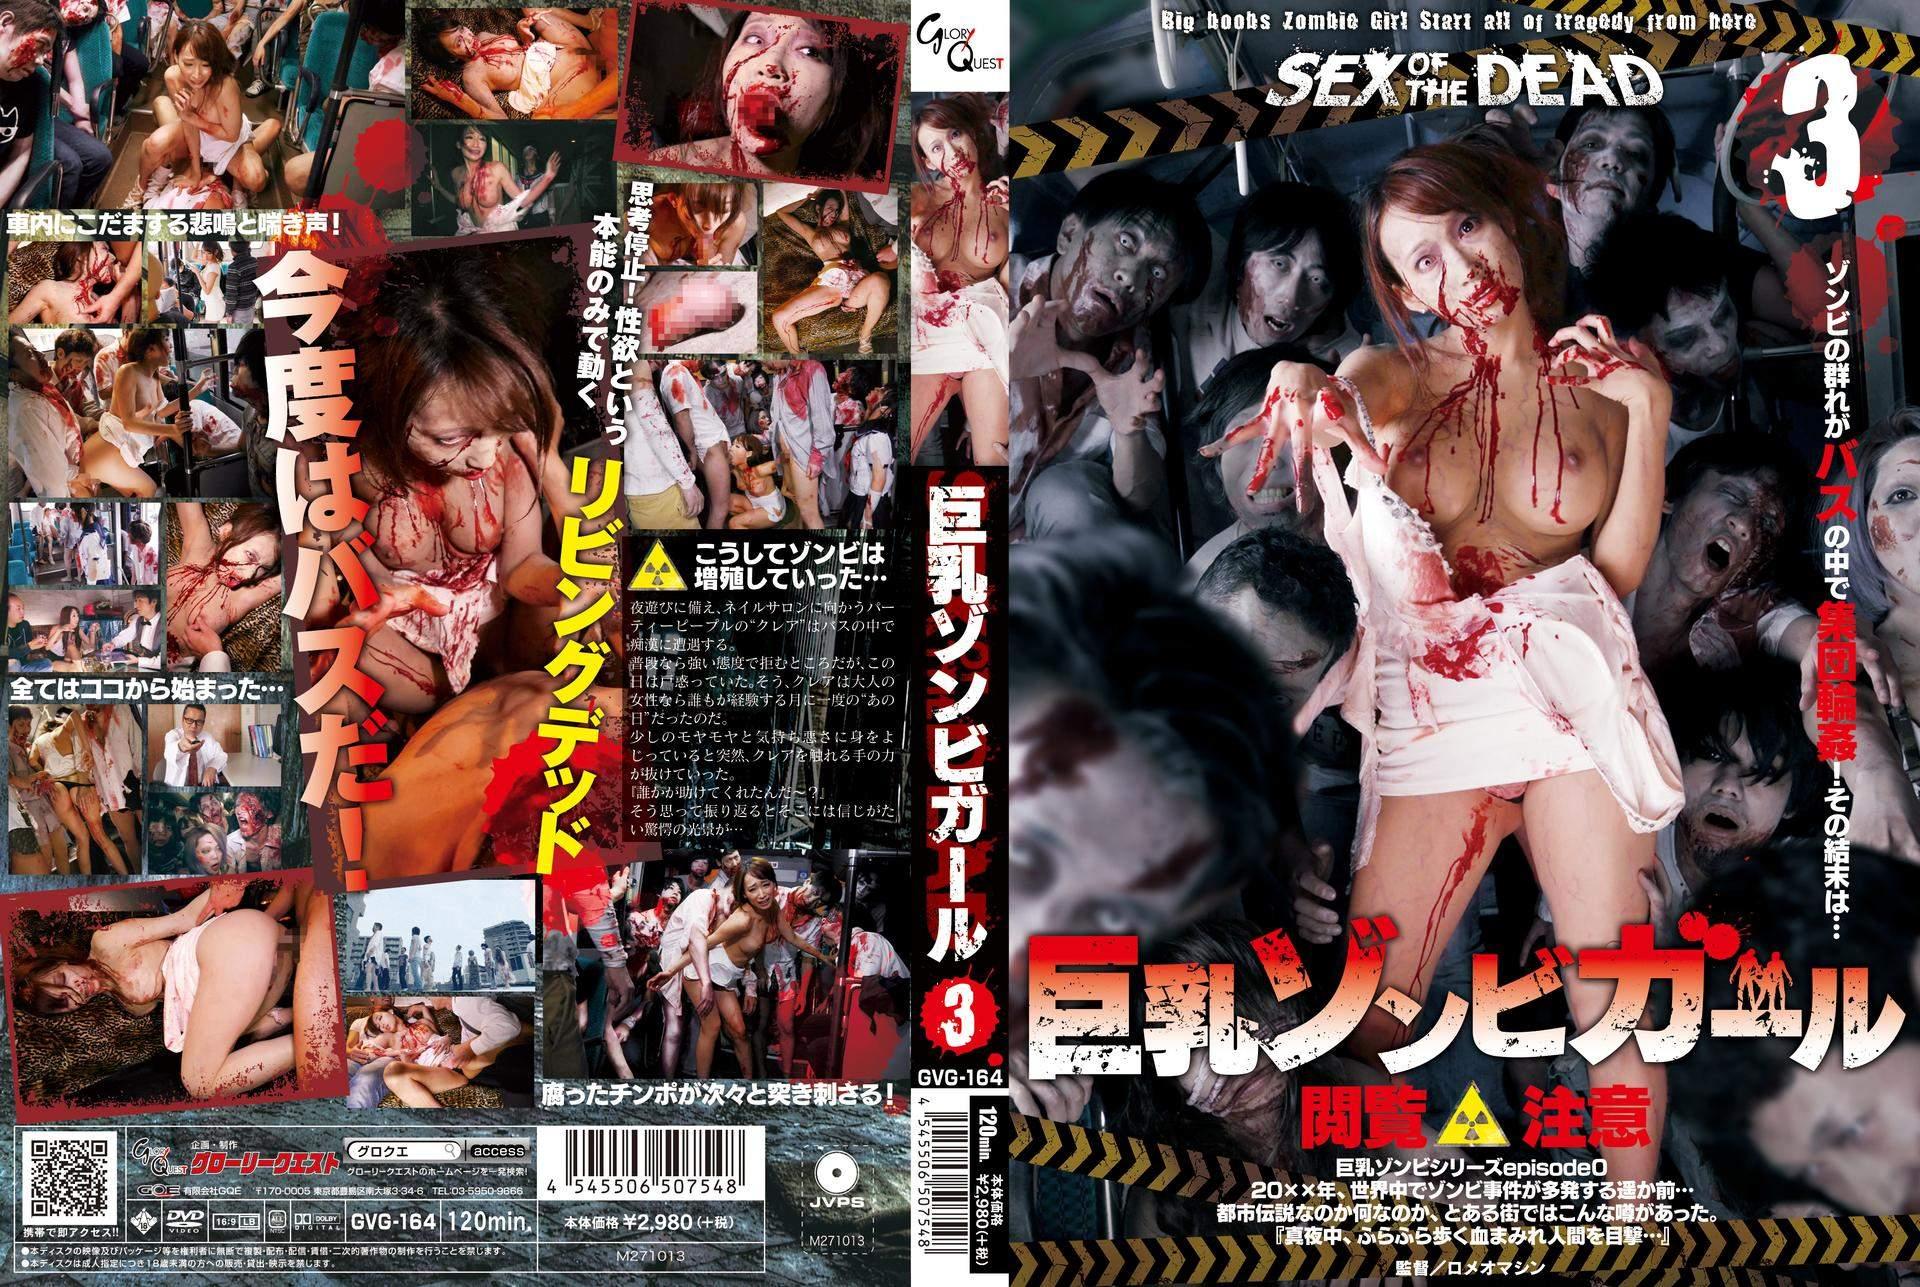 SEX OF THE DEAD 巨乳ゾンビガール3 蓮実クレア